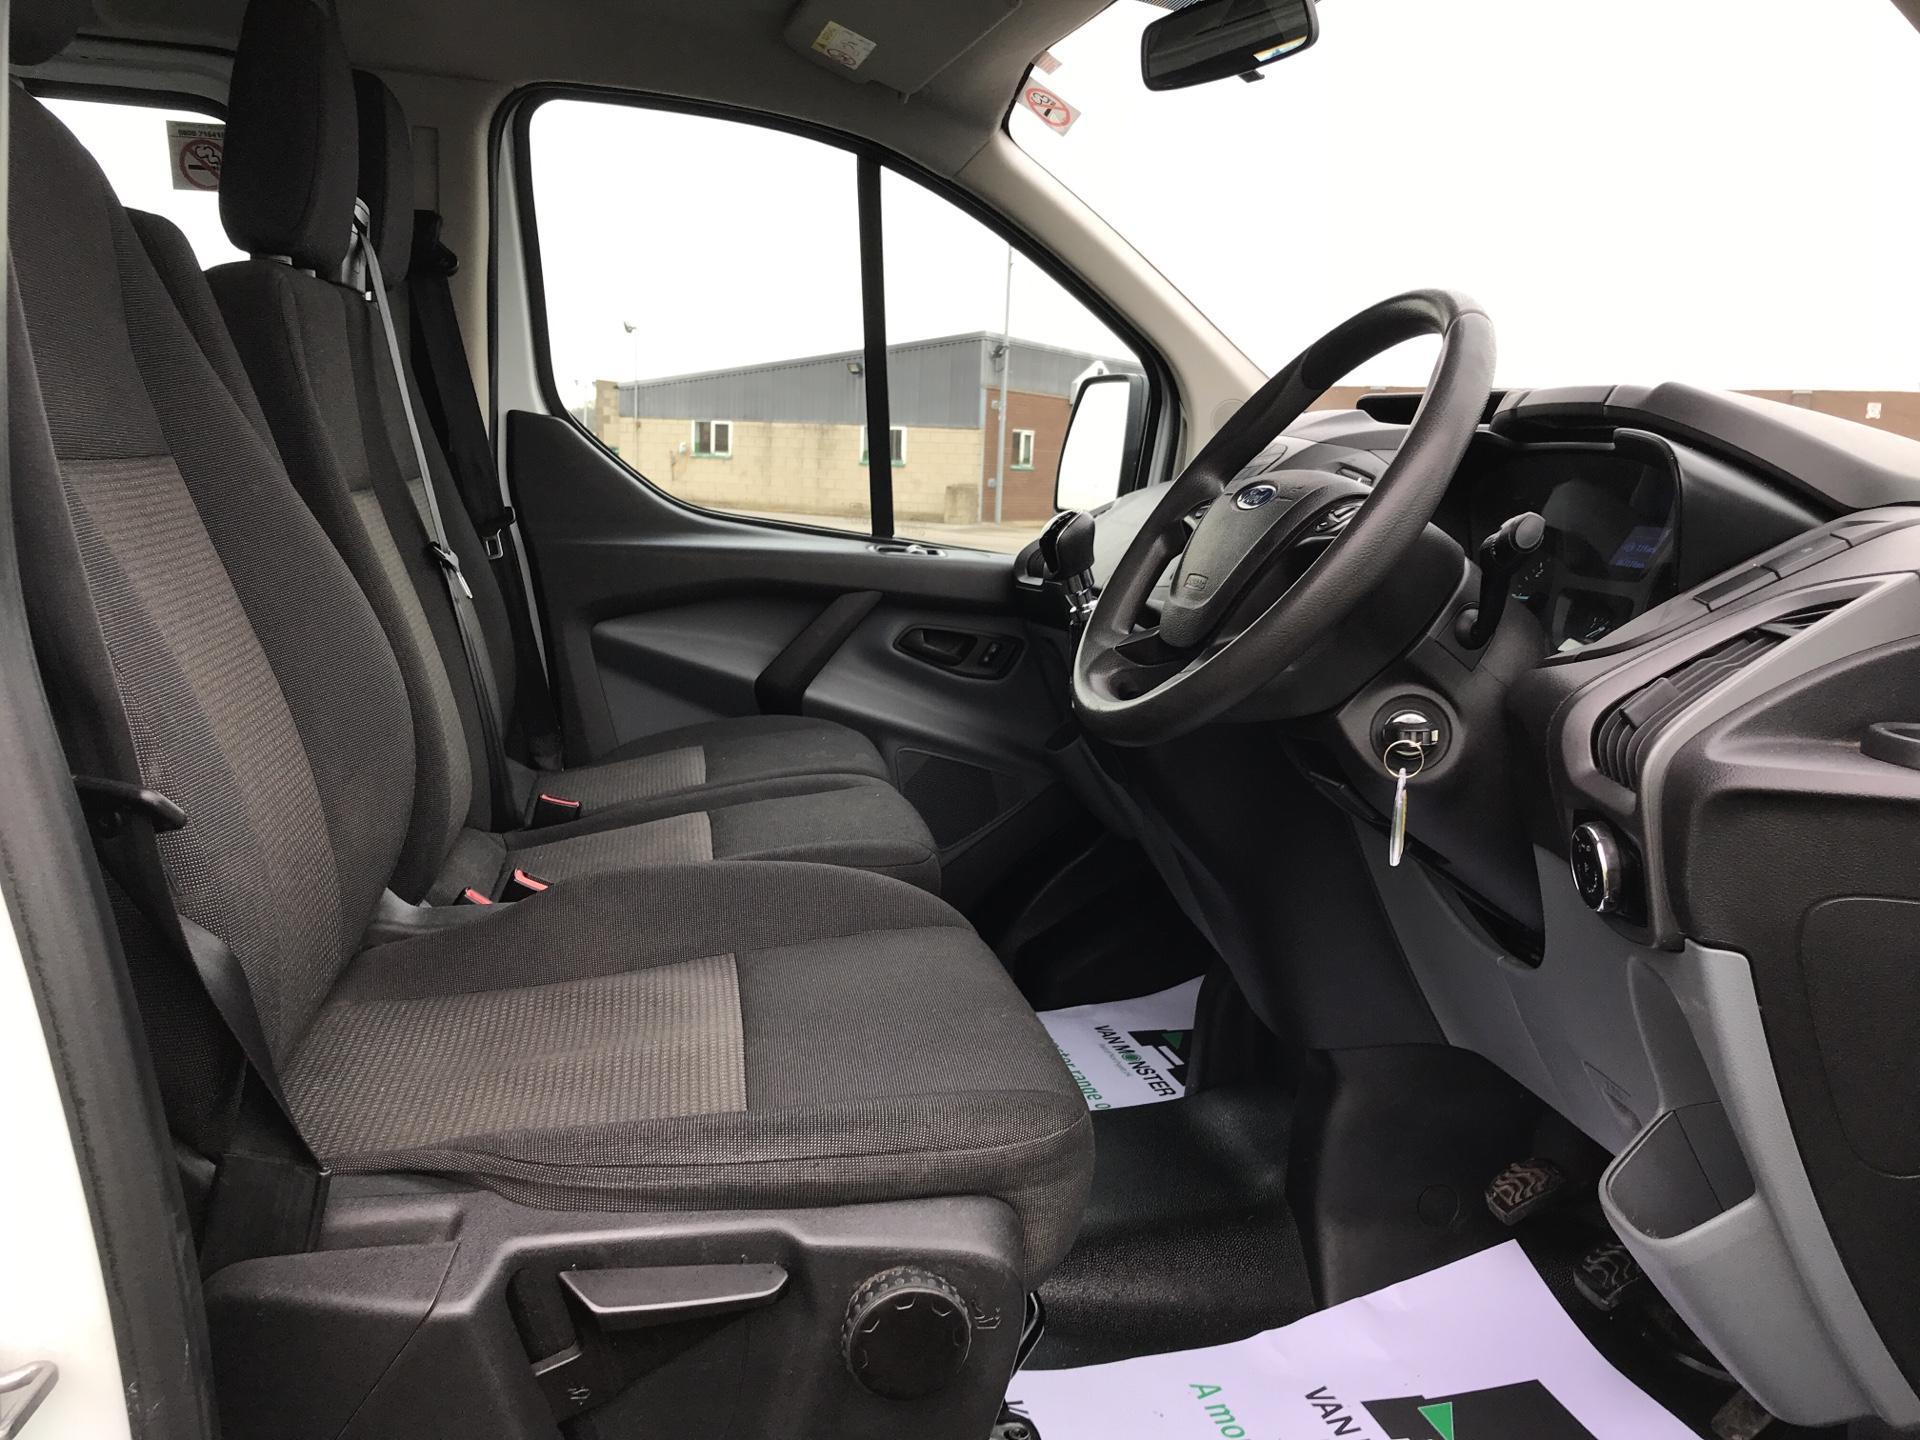 2015 Ford Transit Custom 310 L2 DIESEL FWD 2.2 TDCI 125PS LOW ROOF KOMBI VAN EURO 5 VAT INC (WV15JNJ) Image 9